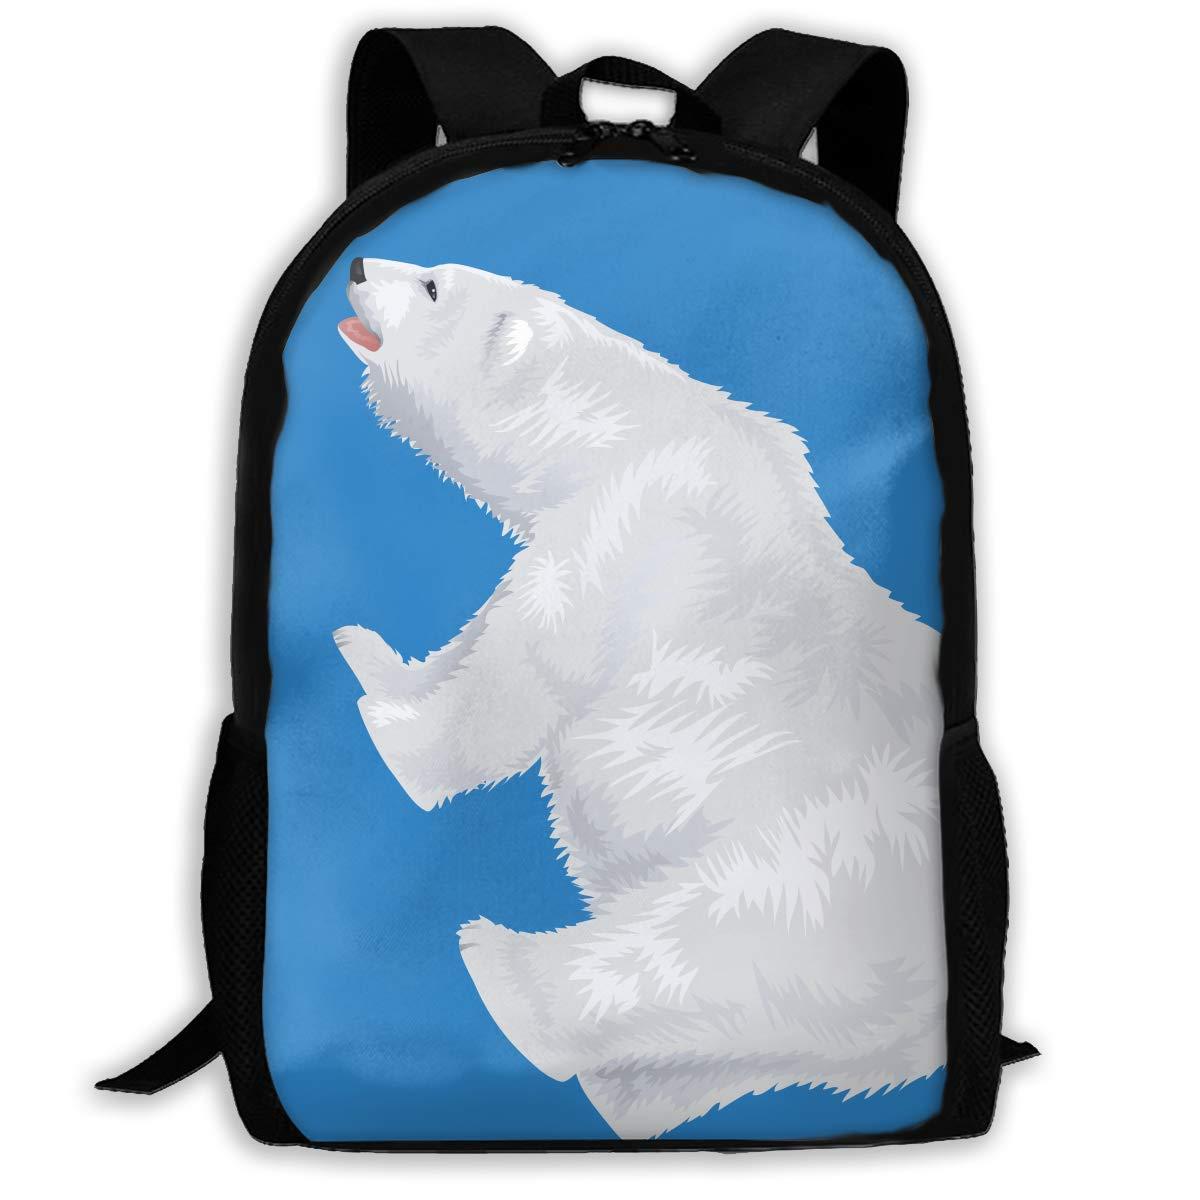 Casual Backpack Weiß-Polar-Bear-Transparent-Clip-Art-Image Weiß-Polar-Bear-Transparent-Clip-Art-Image Weiß-Polar-Bear-Transparent-Clip-Art-Image 3D Printing School Bags for Boys Girls Unisex Adult Shoulder Bag Daily Bag bd4830